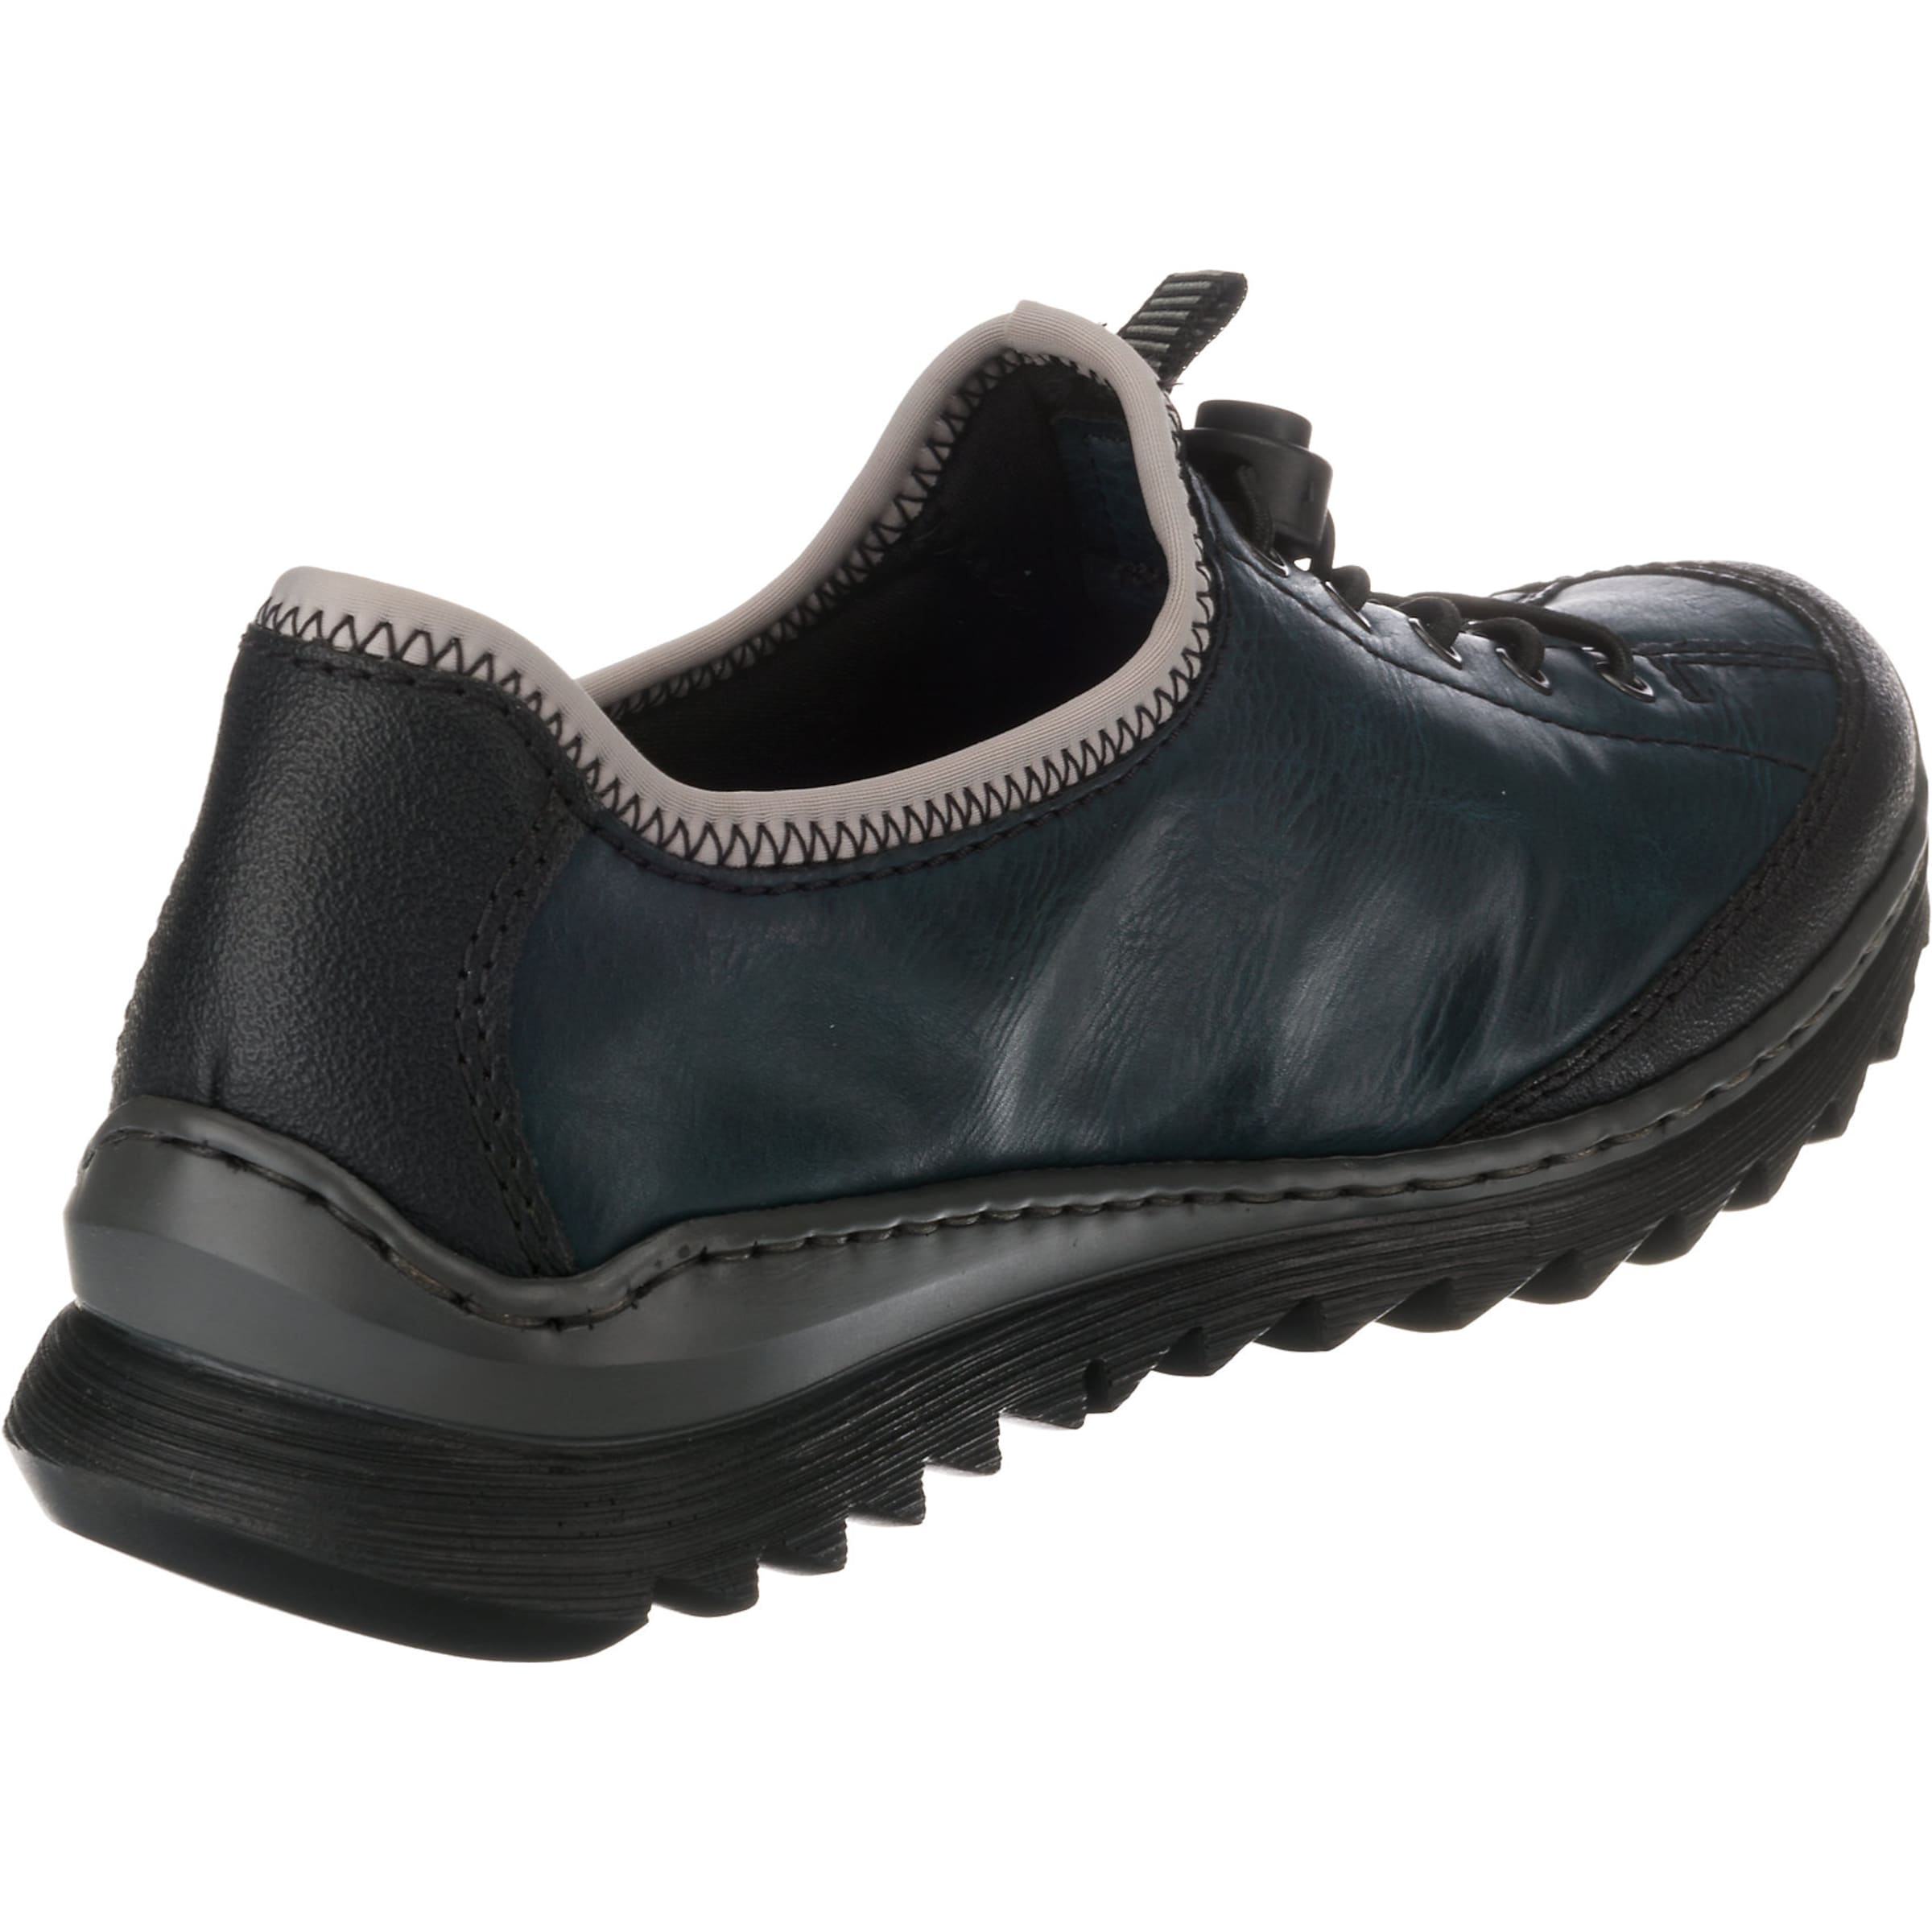 PetrolSchwarz Rieker Rieker PetrolSchwarz Rieker In Sneaker PetrolSchwarz Sneaker Sneaker In In OPkTZXiu